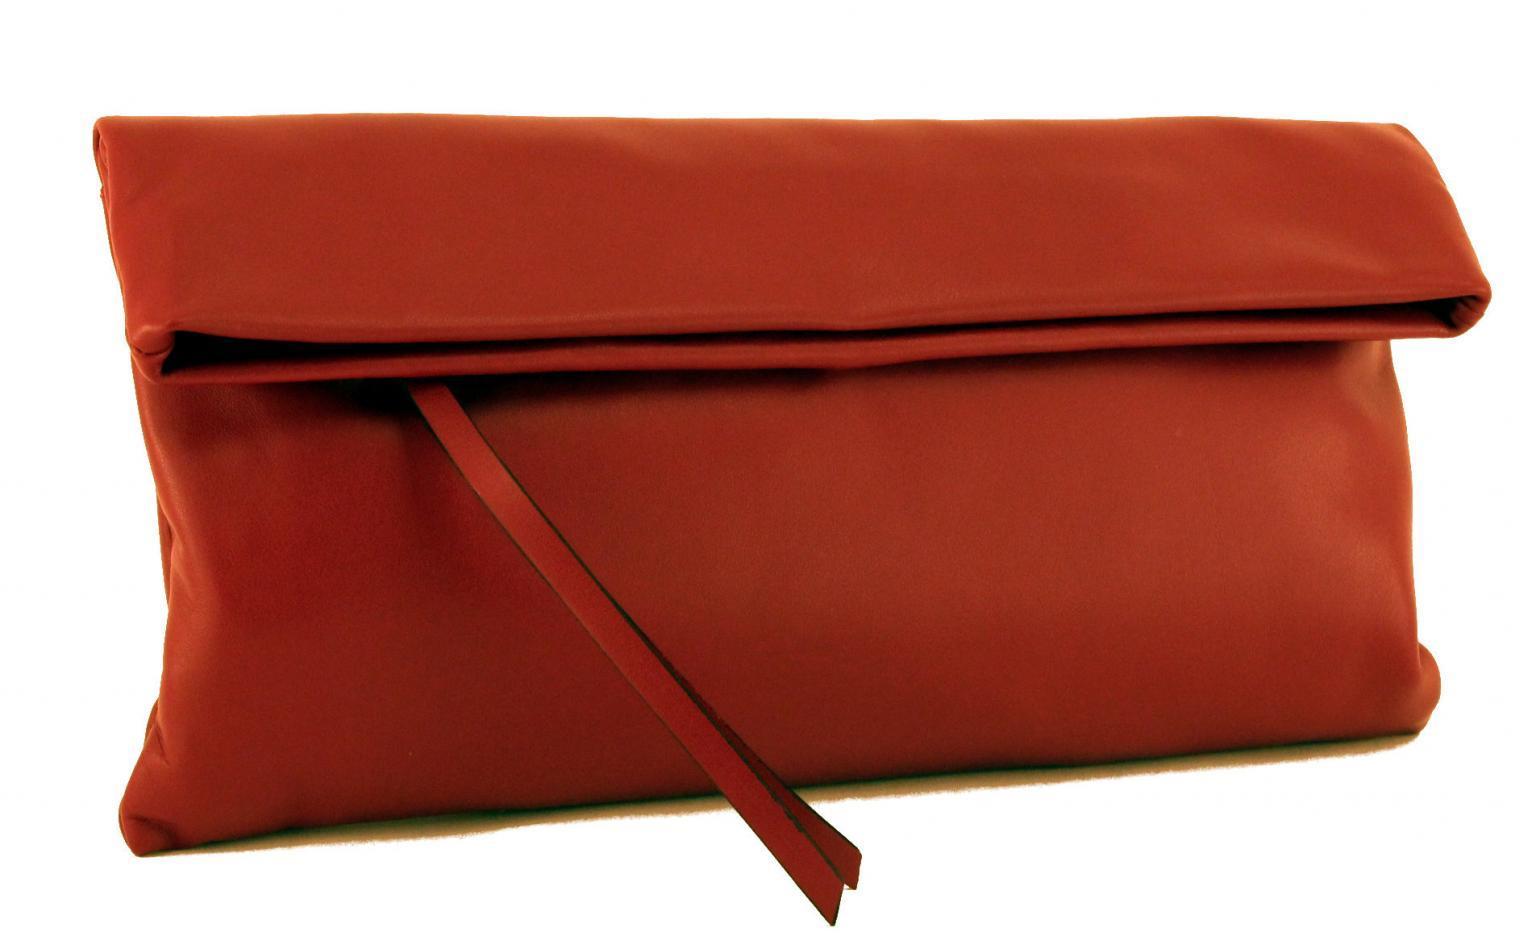 Gianni Chiarini Clutch Large Ledertasche Prezioso Rot